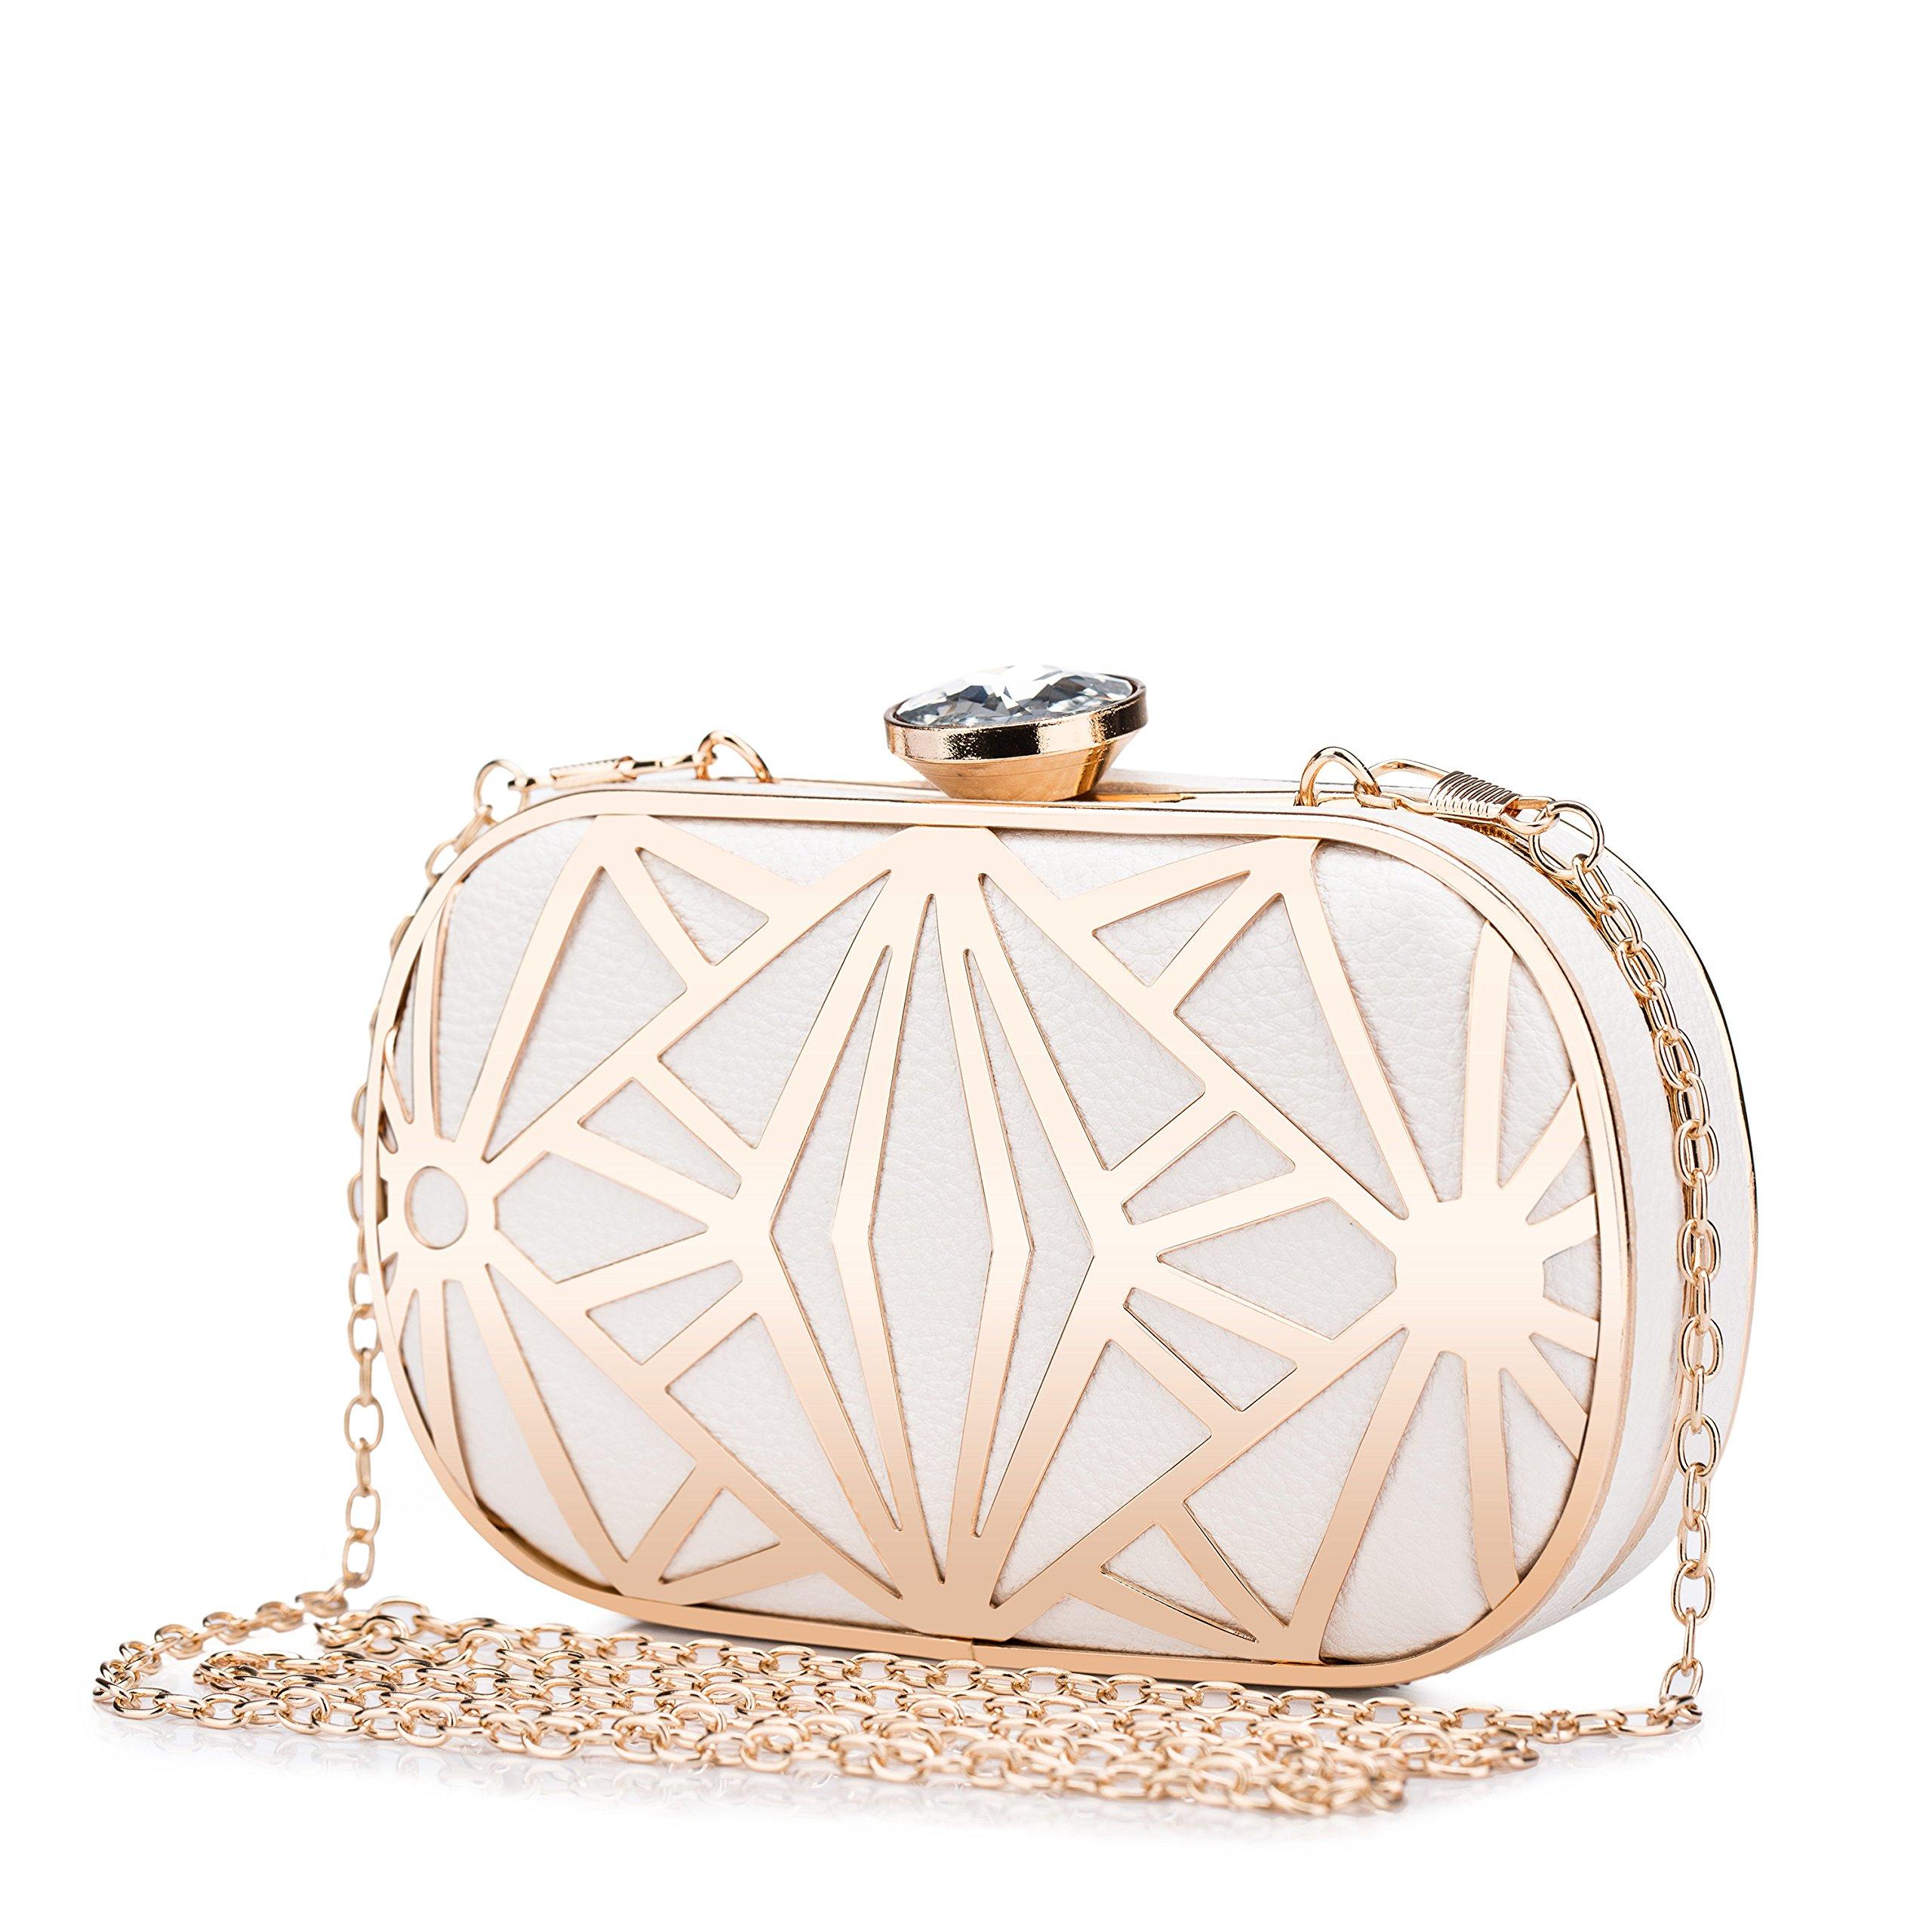 Clocolor Women Evening Bags Exquisite Leather Handbag Metal Hollow Designer Wedding Party Clutch Purse